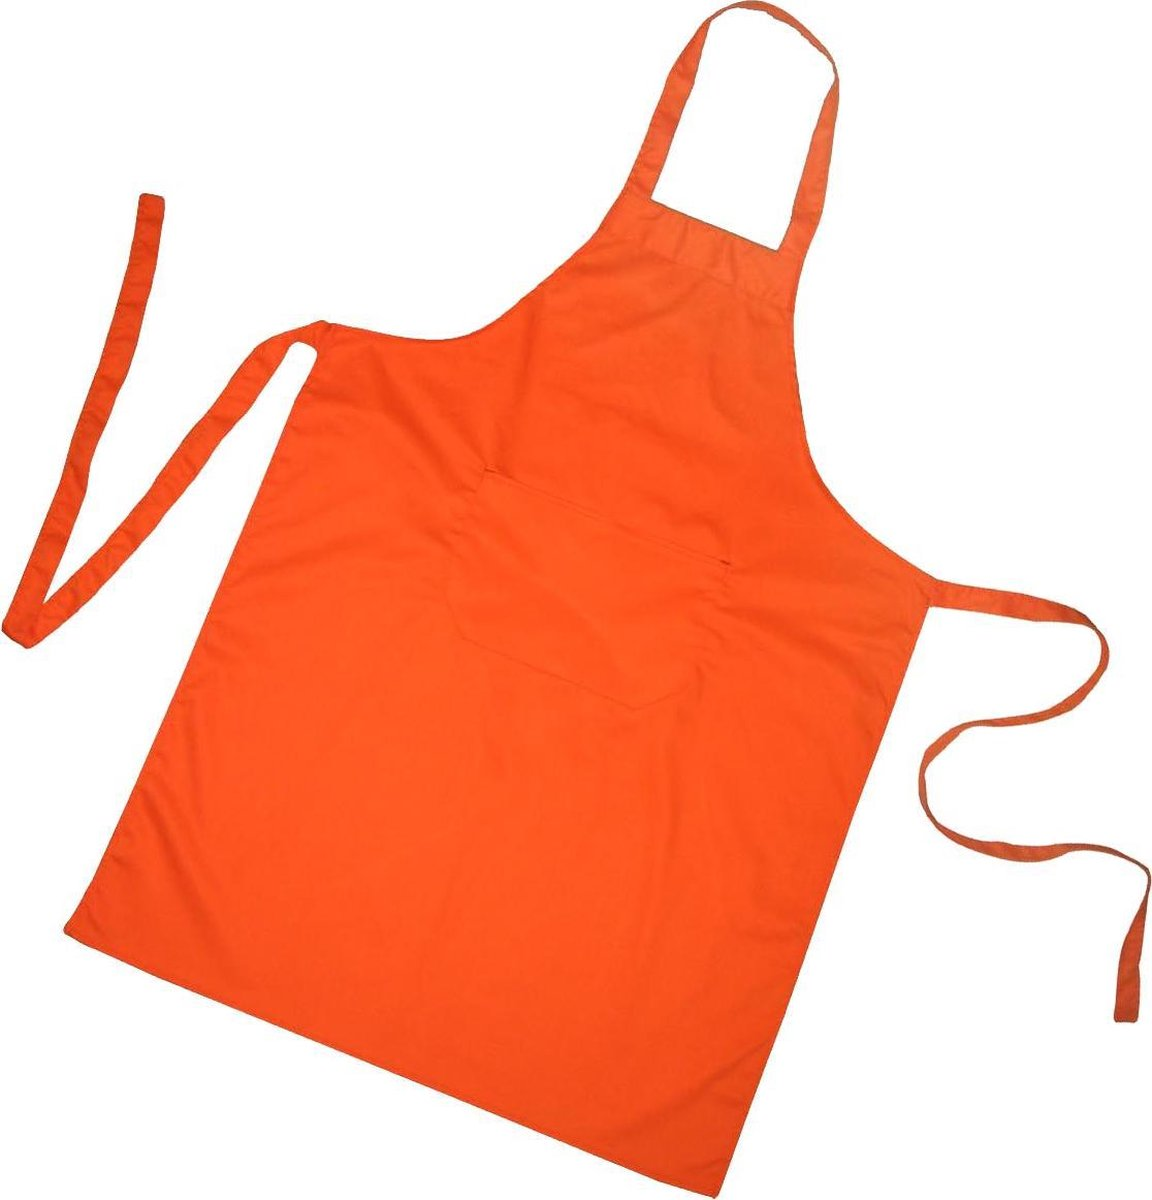 Homéé® Horeca suite Keukenschorten BBQ BIB Apron - oranje - 70x100 cm - 2 stuks